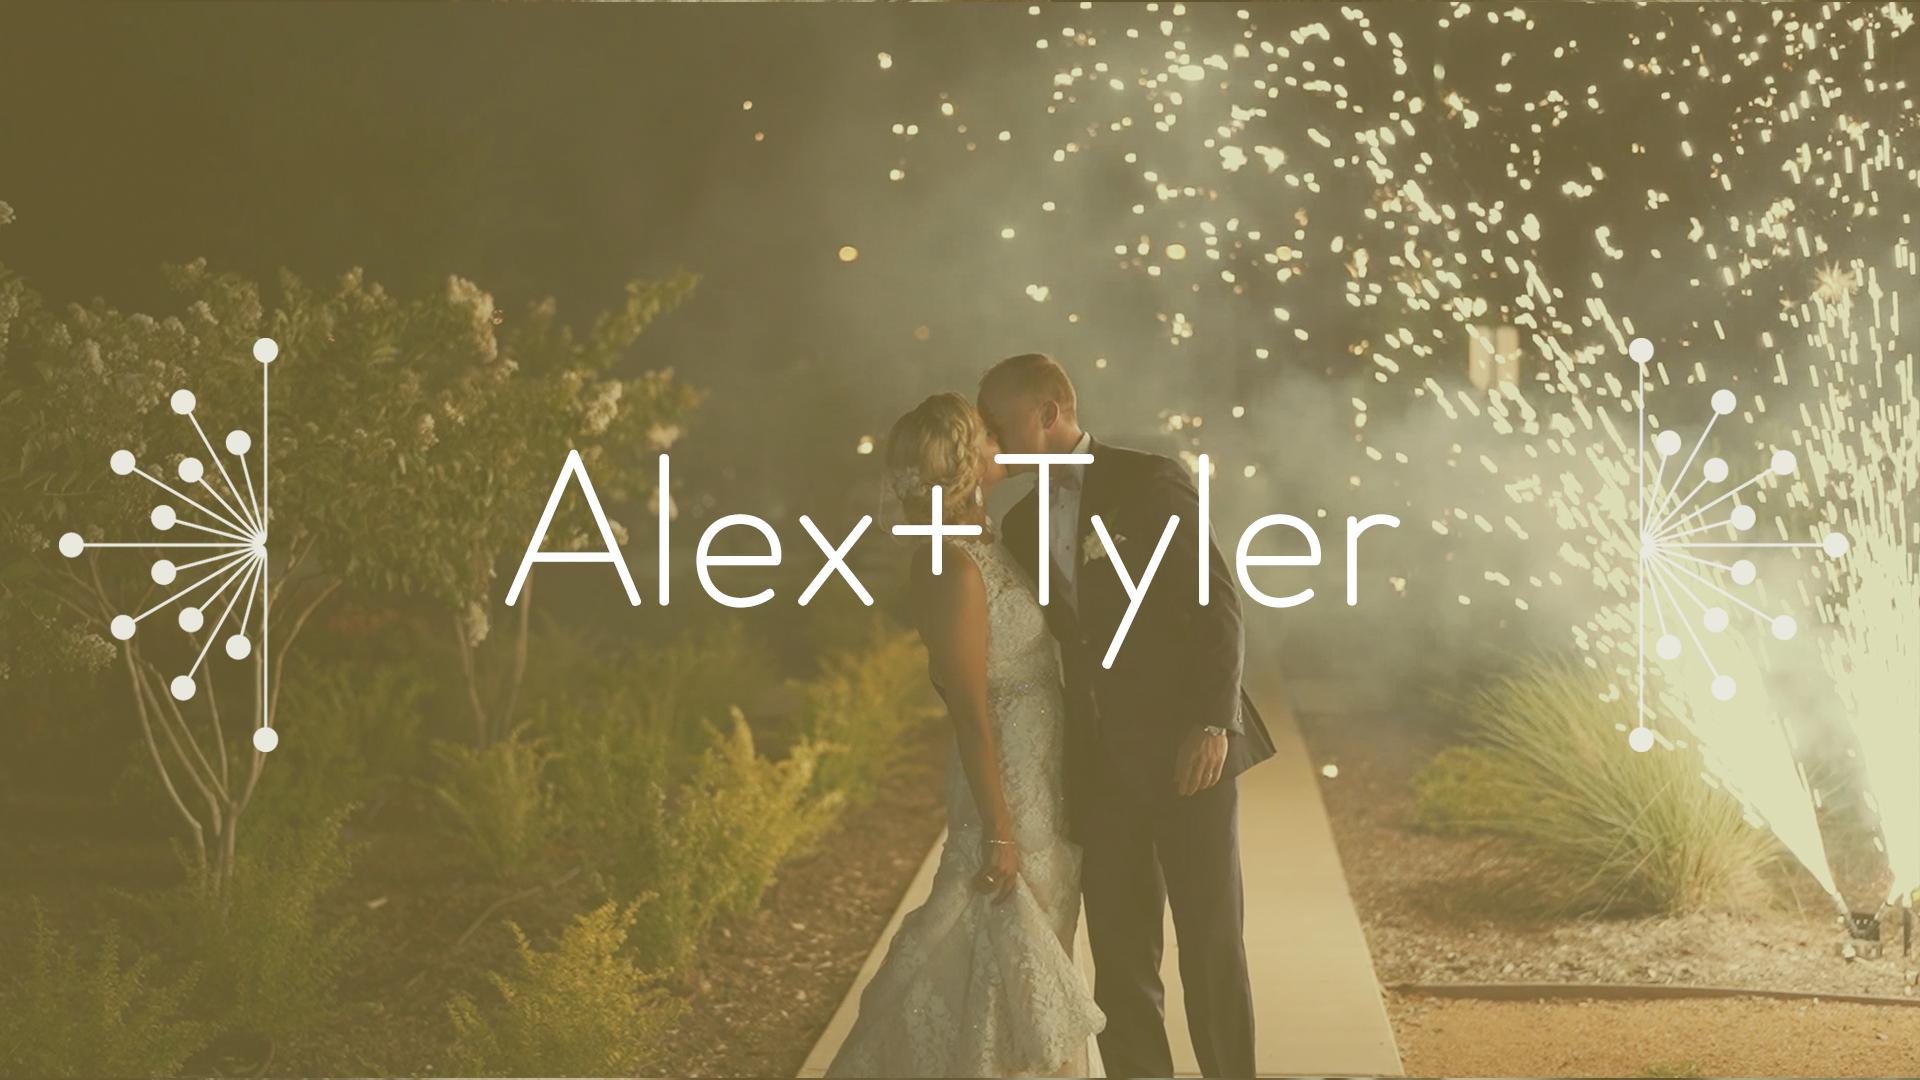 Alex + Tyler | Dallas, Texas | Verona Villa